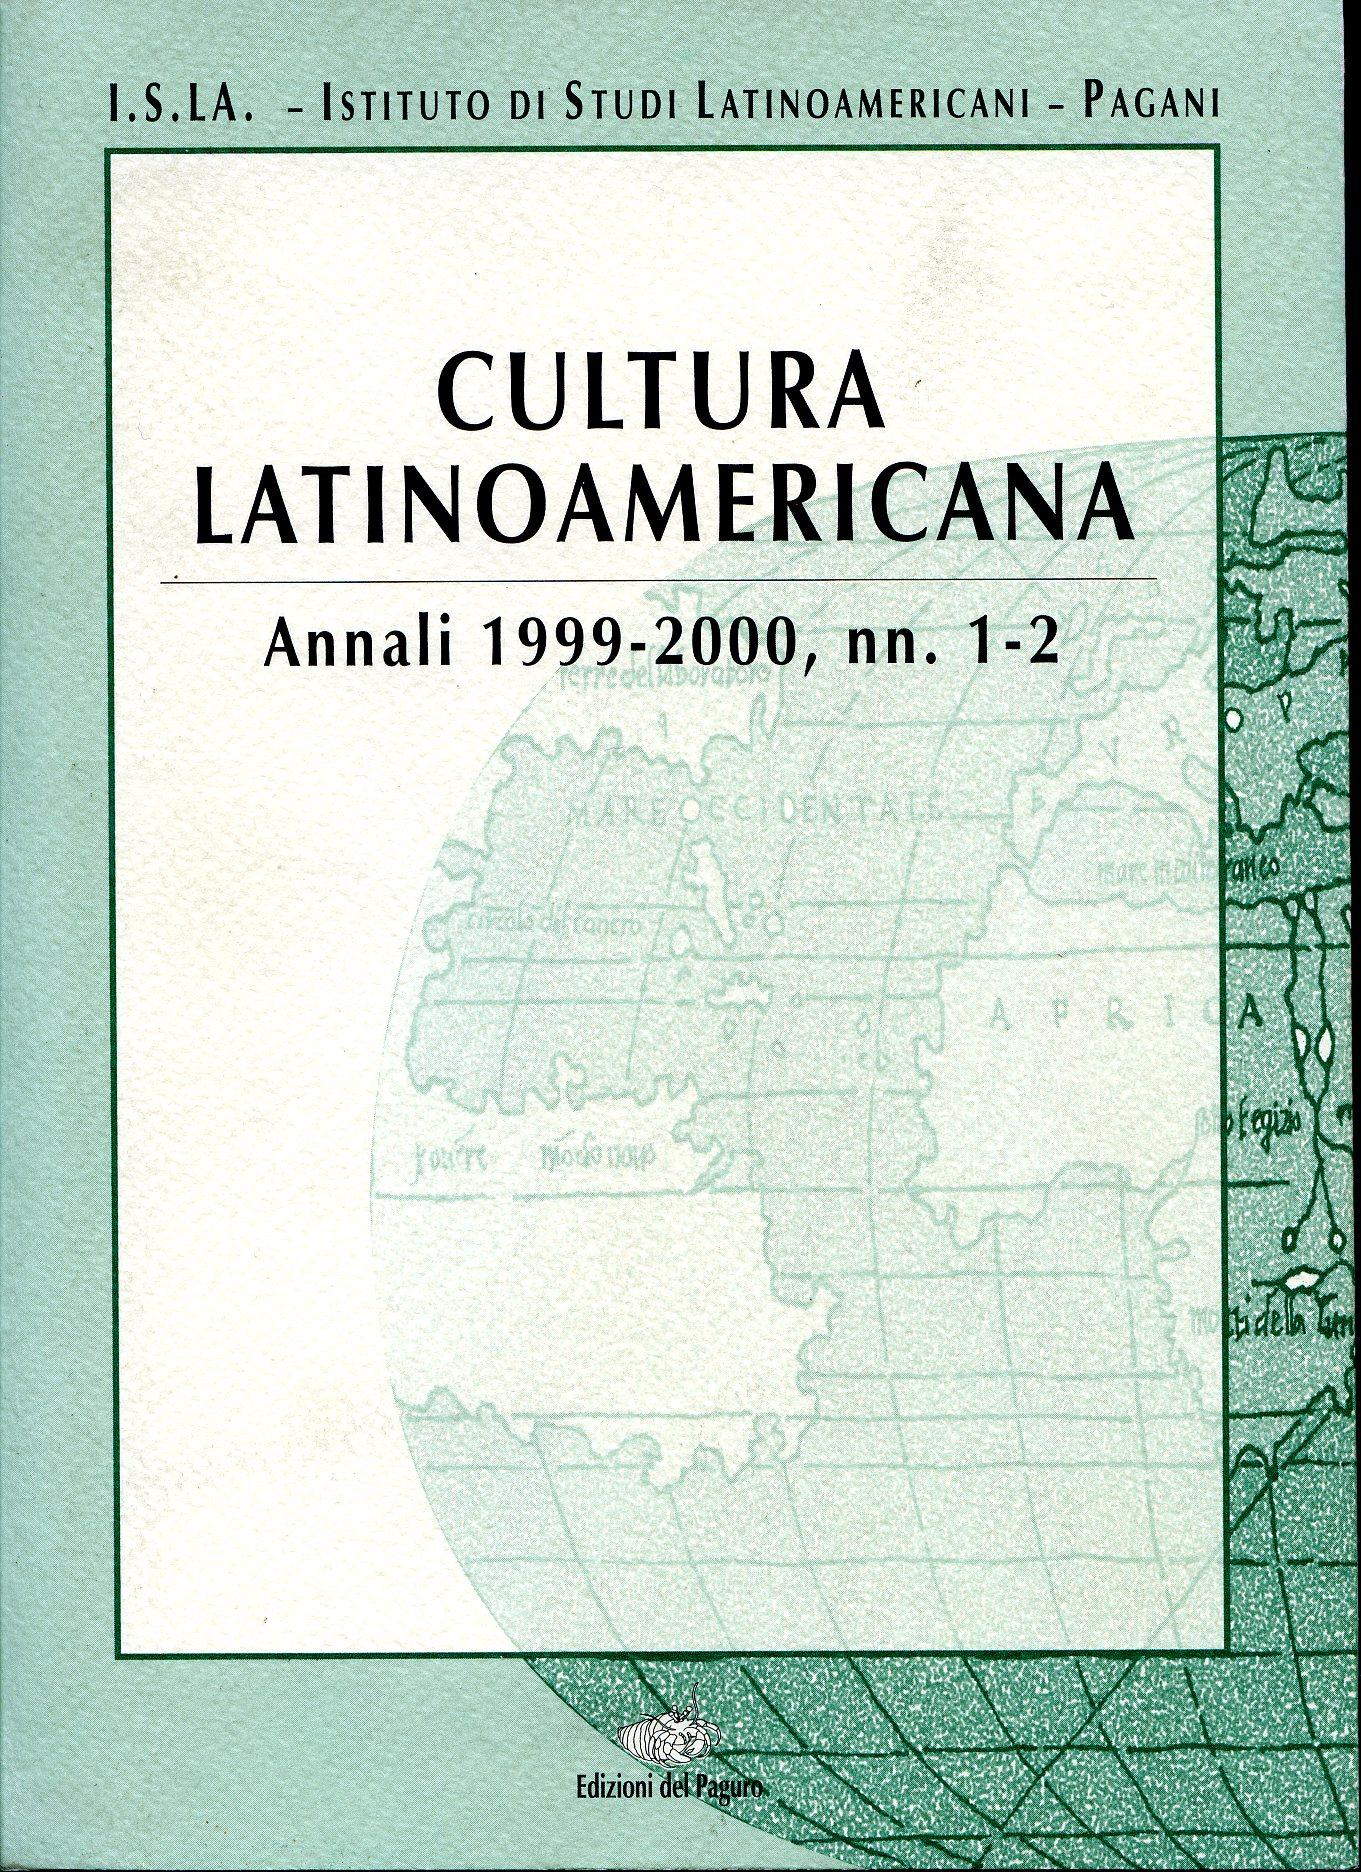 Cultura latinoamericana (1999-2000)